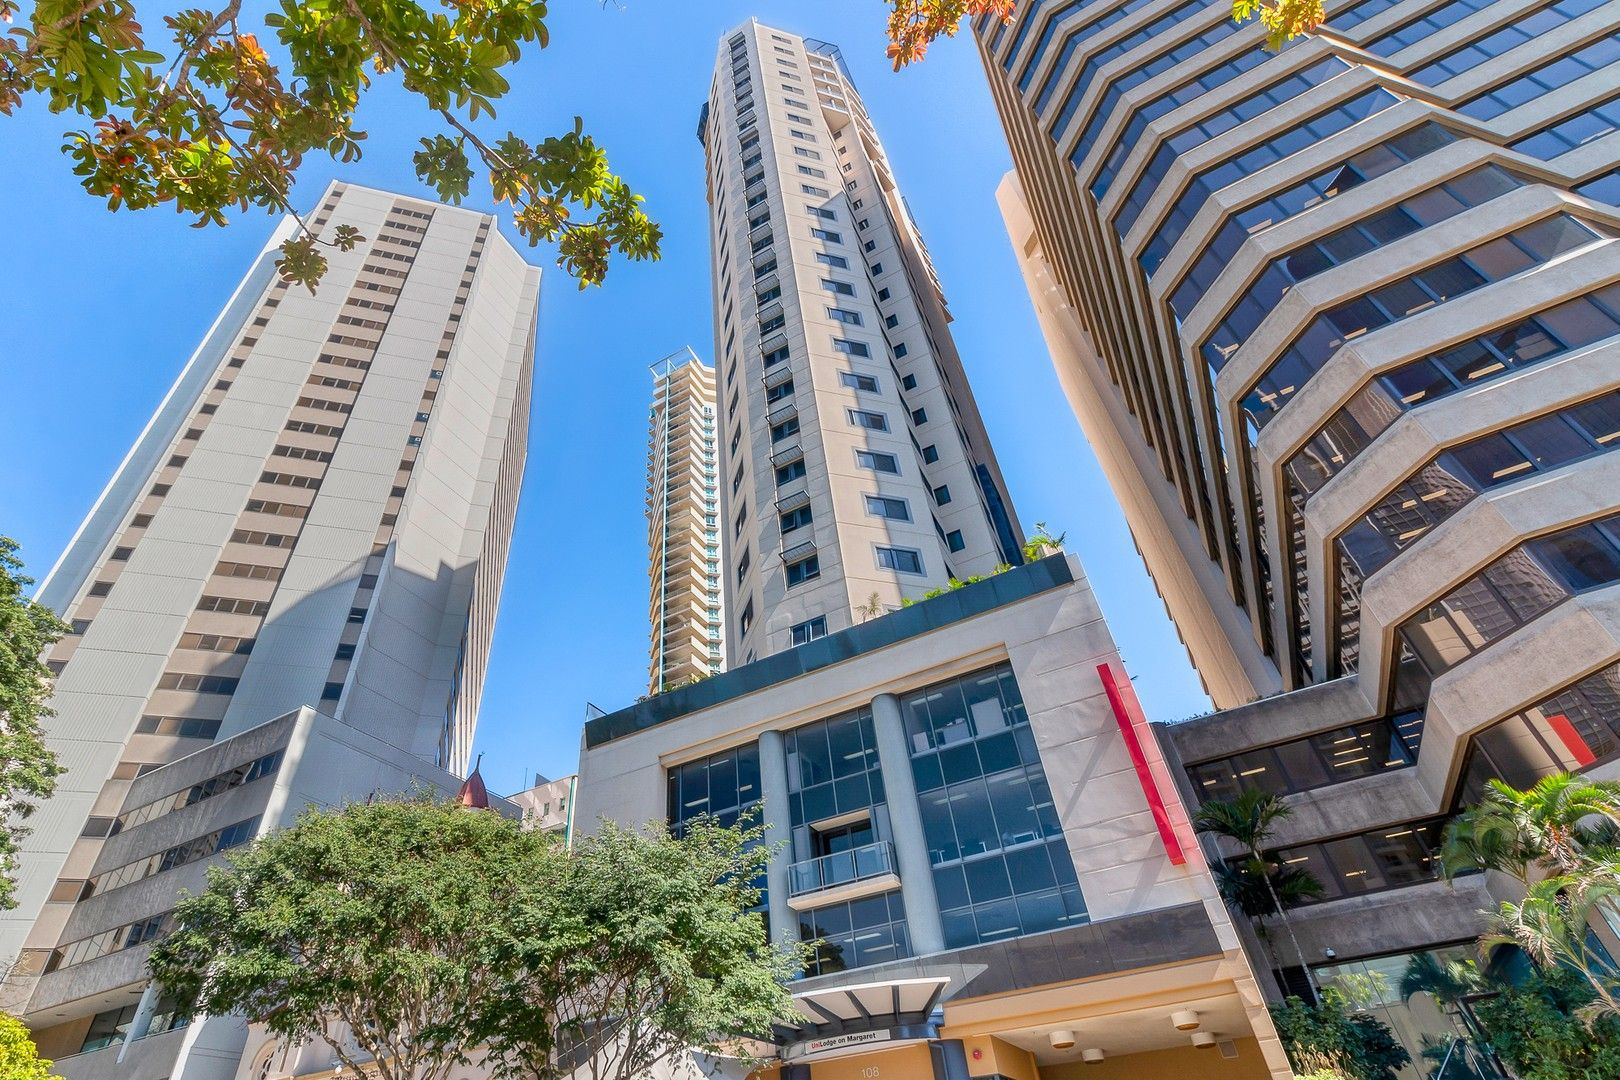 1 bedrooms Apartment / Unit / Flat in 108 Margaret Street BRISBANE CITY QLD, 4000